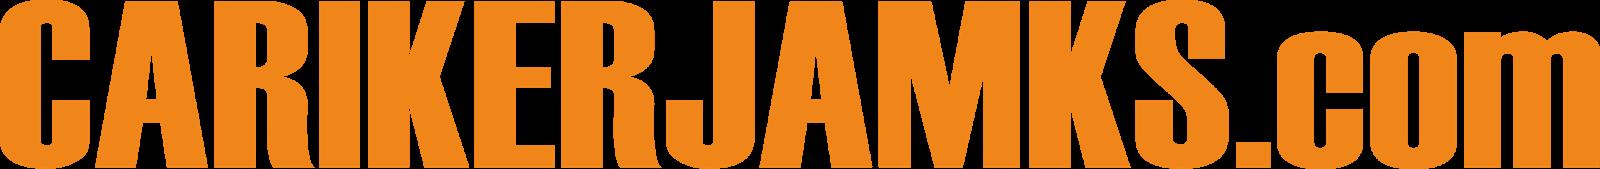 Loker Makassar Terbaru Juni 2017